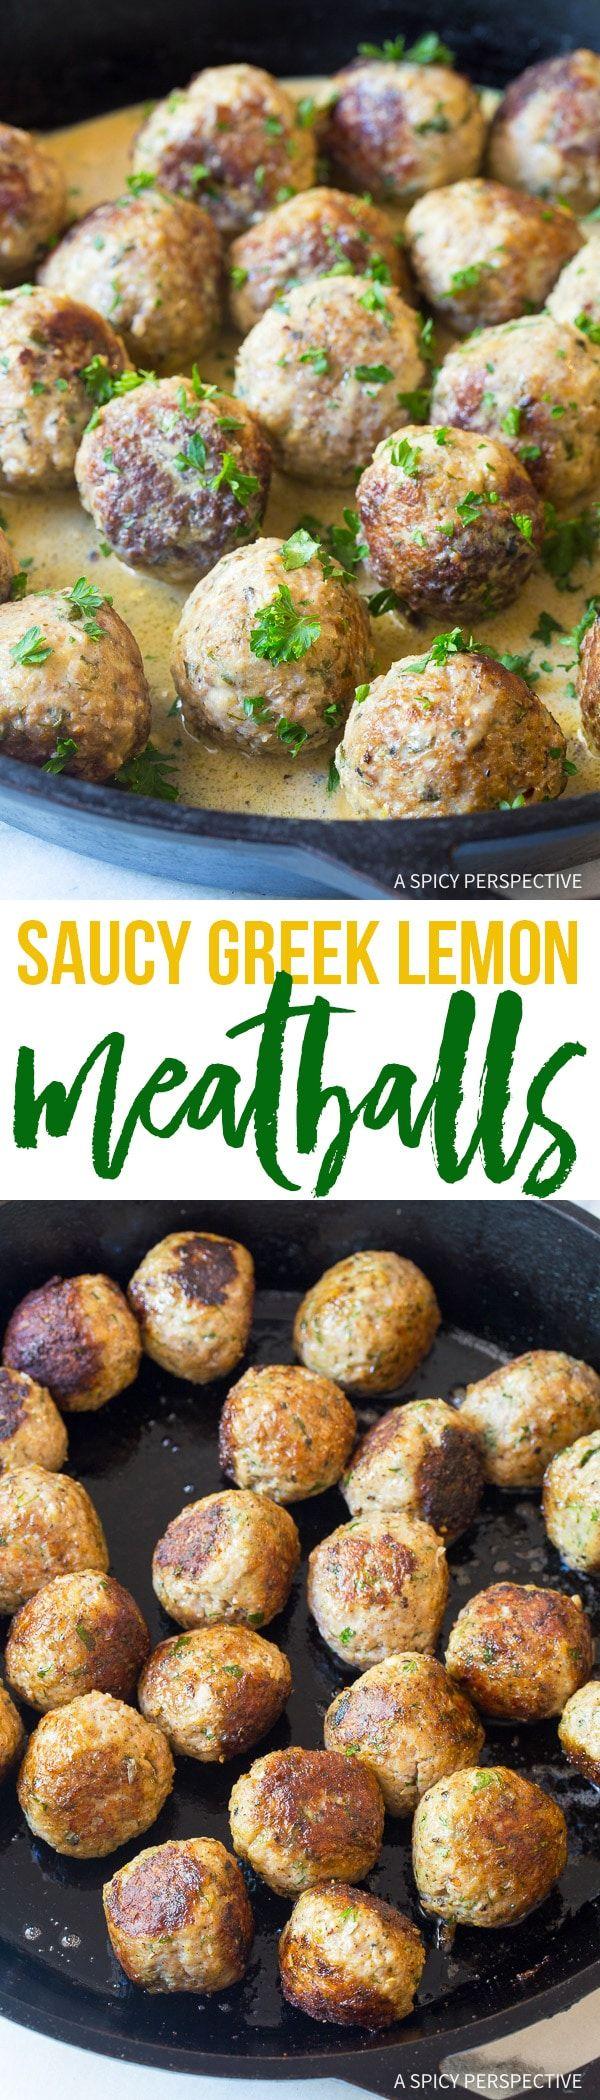 Saucy Greek Lemon Meatballs (Keftedes) Recipe via @spicyperspectiv